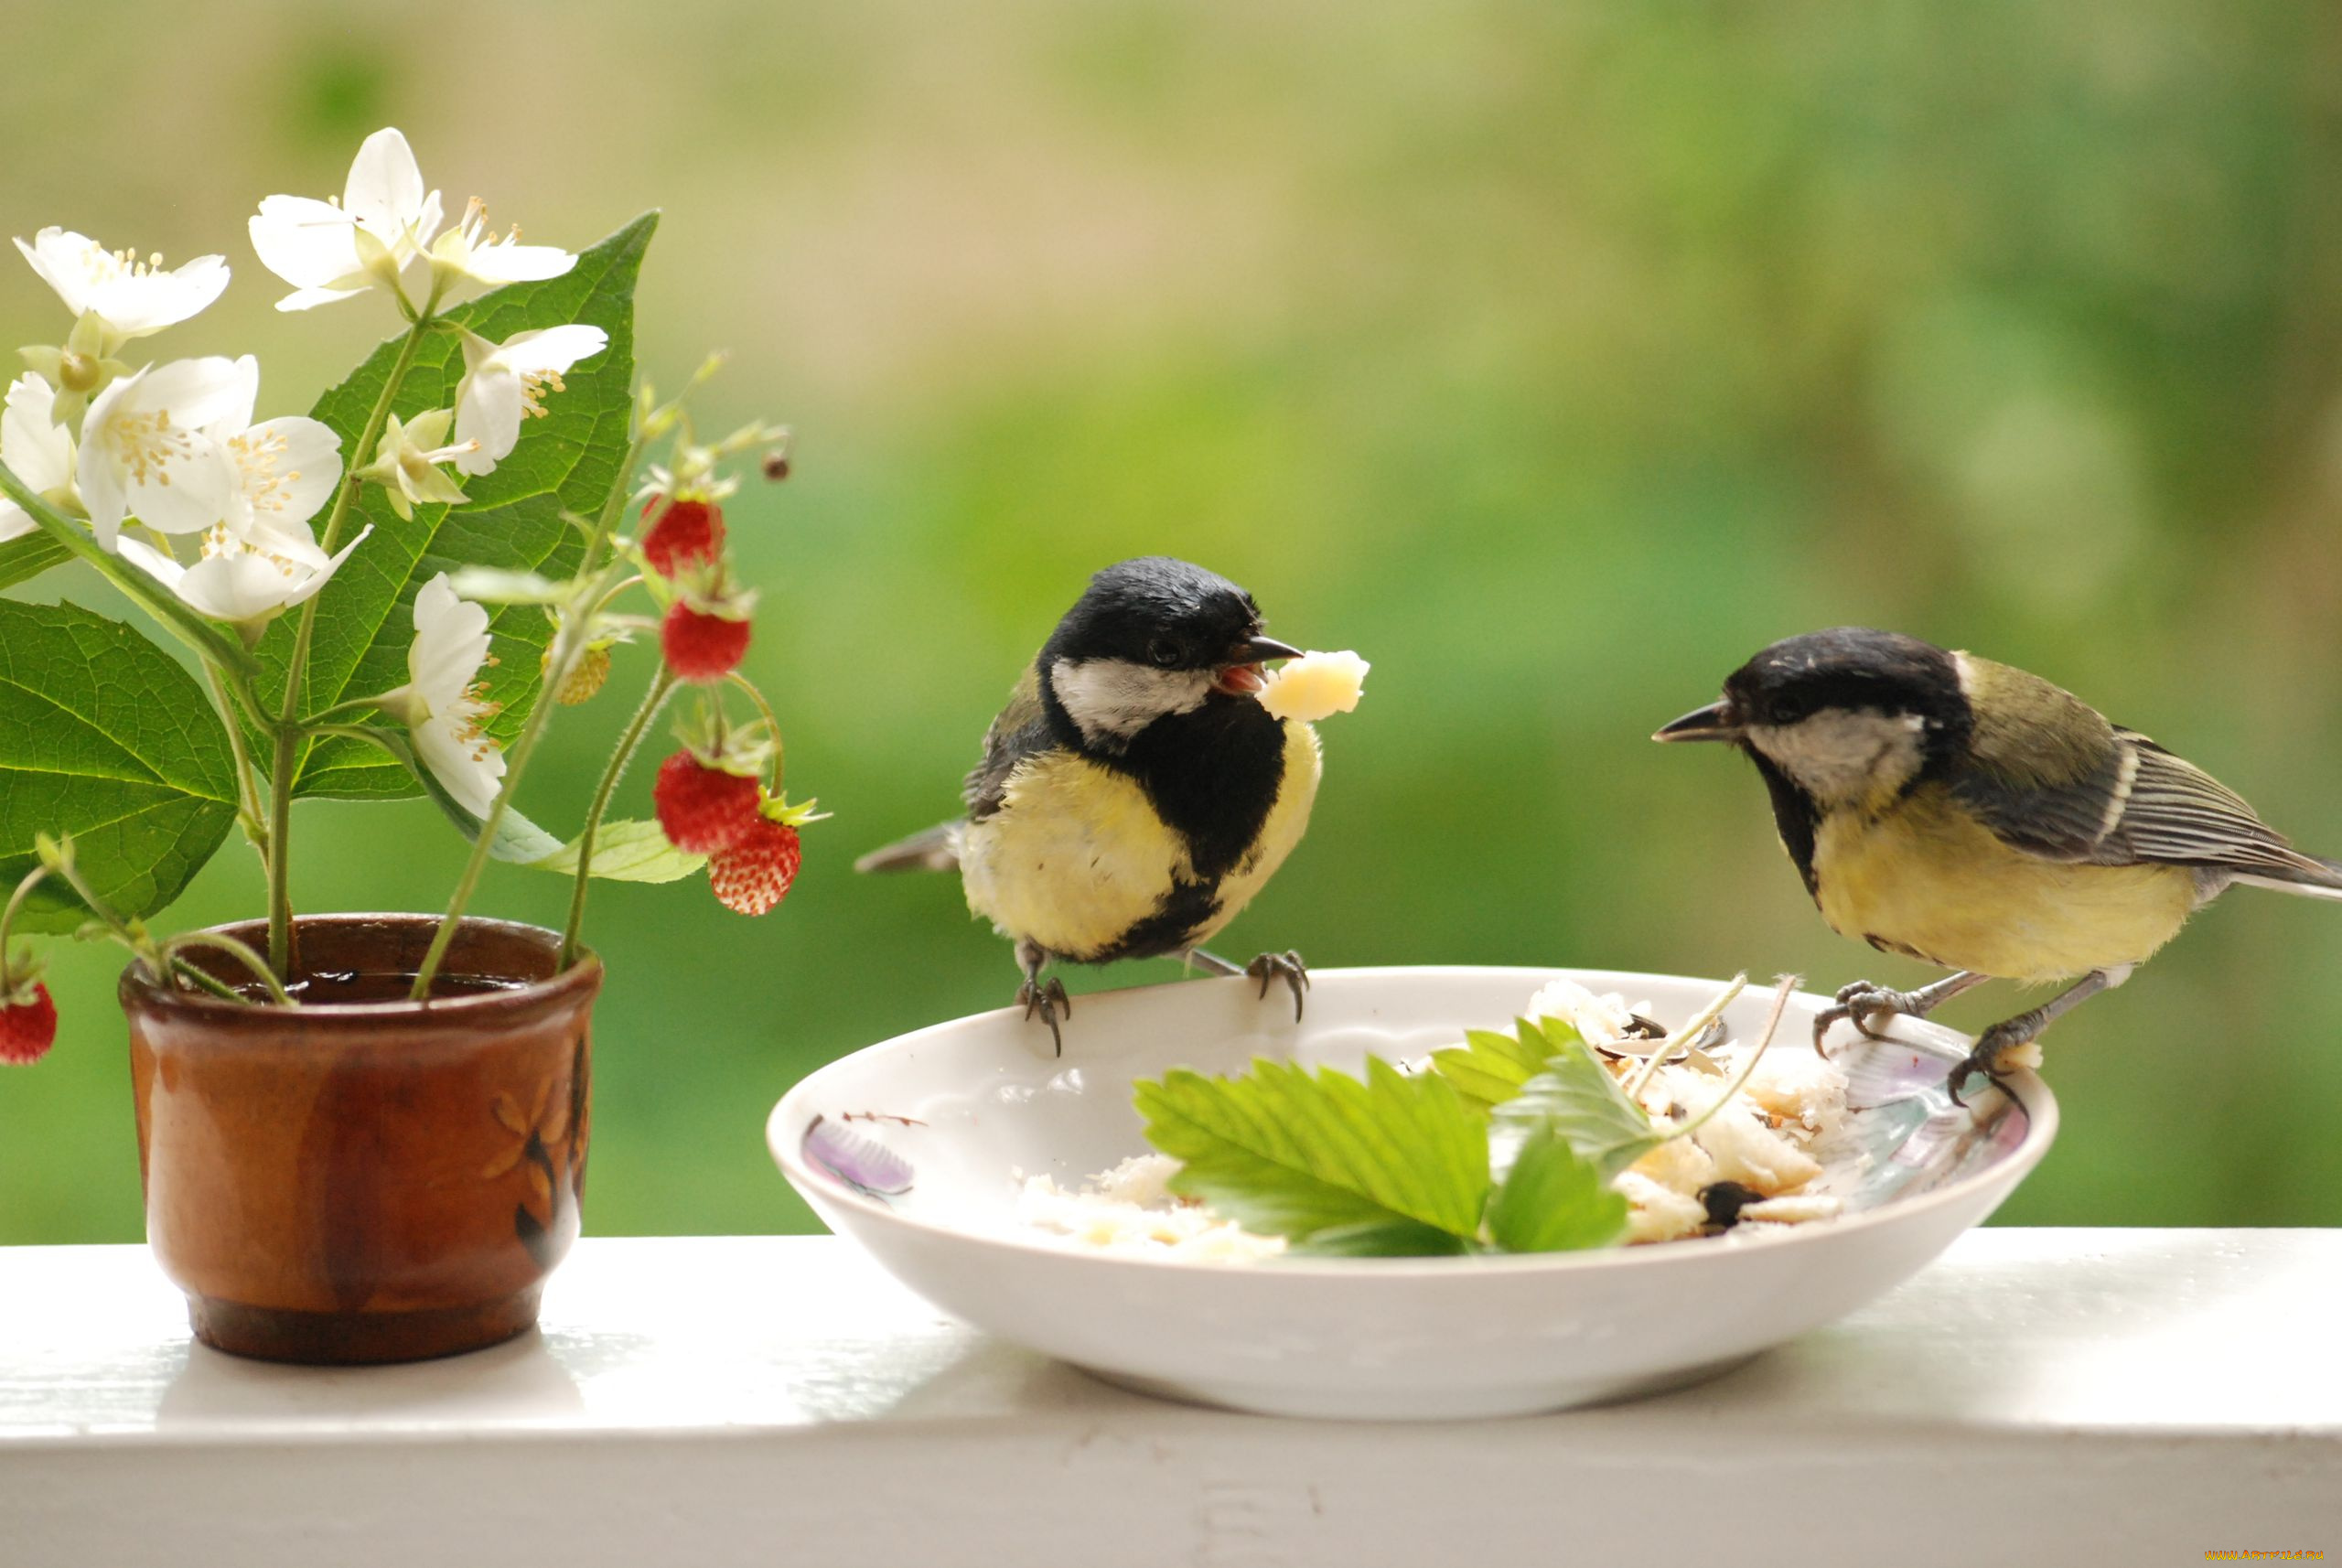 Открытки с добрым утром птичка, роз